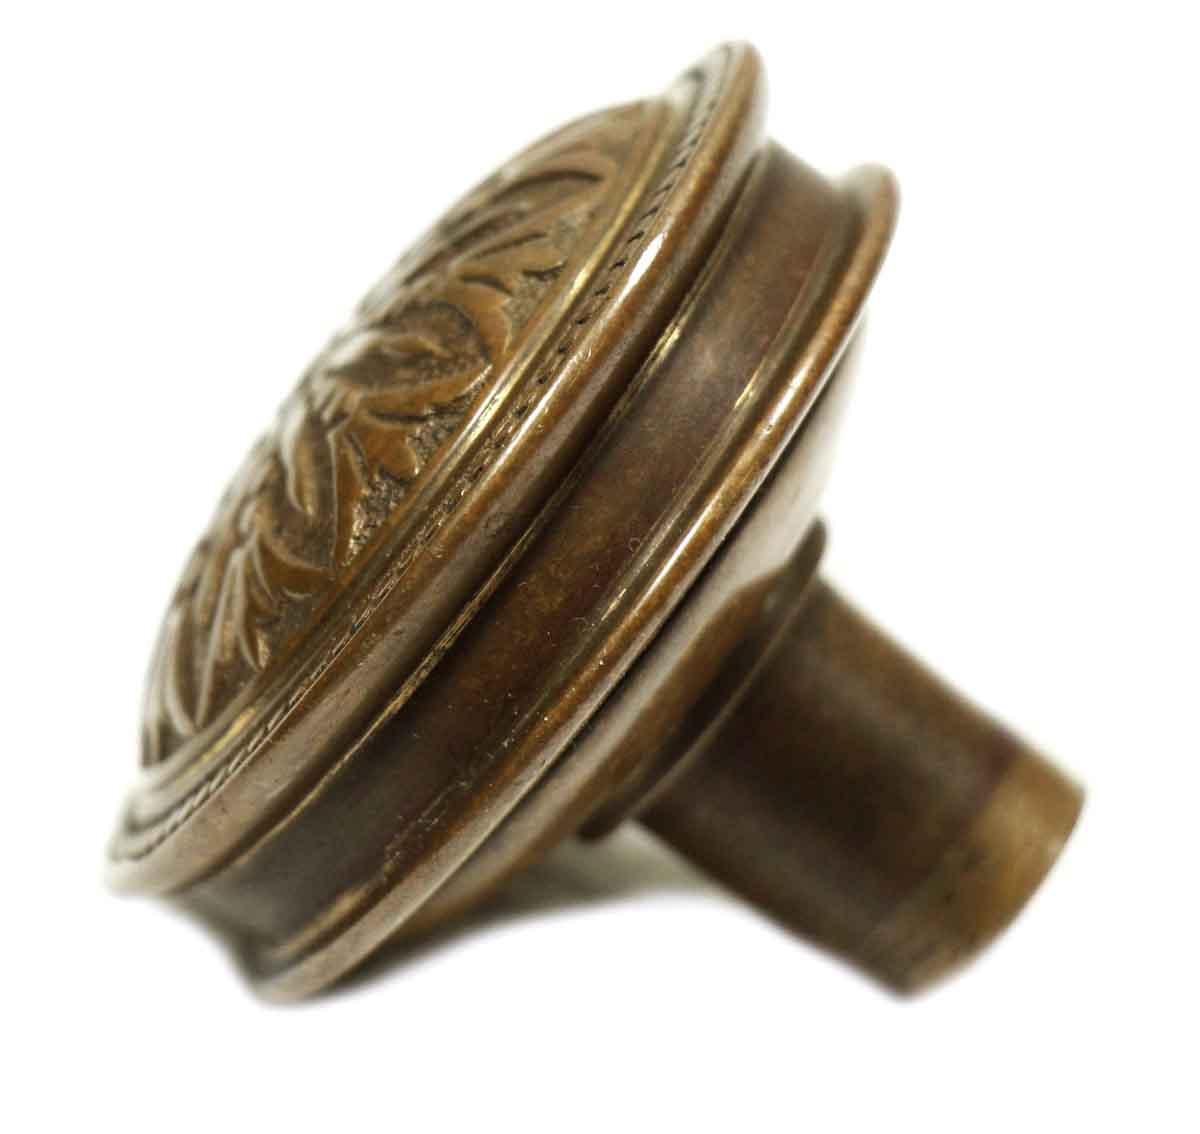 Antique Hopkins & Dickinson Brass Entry Door Knob Set | Olde Good Things